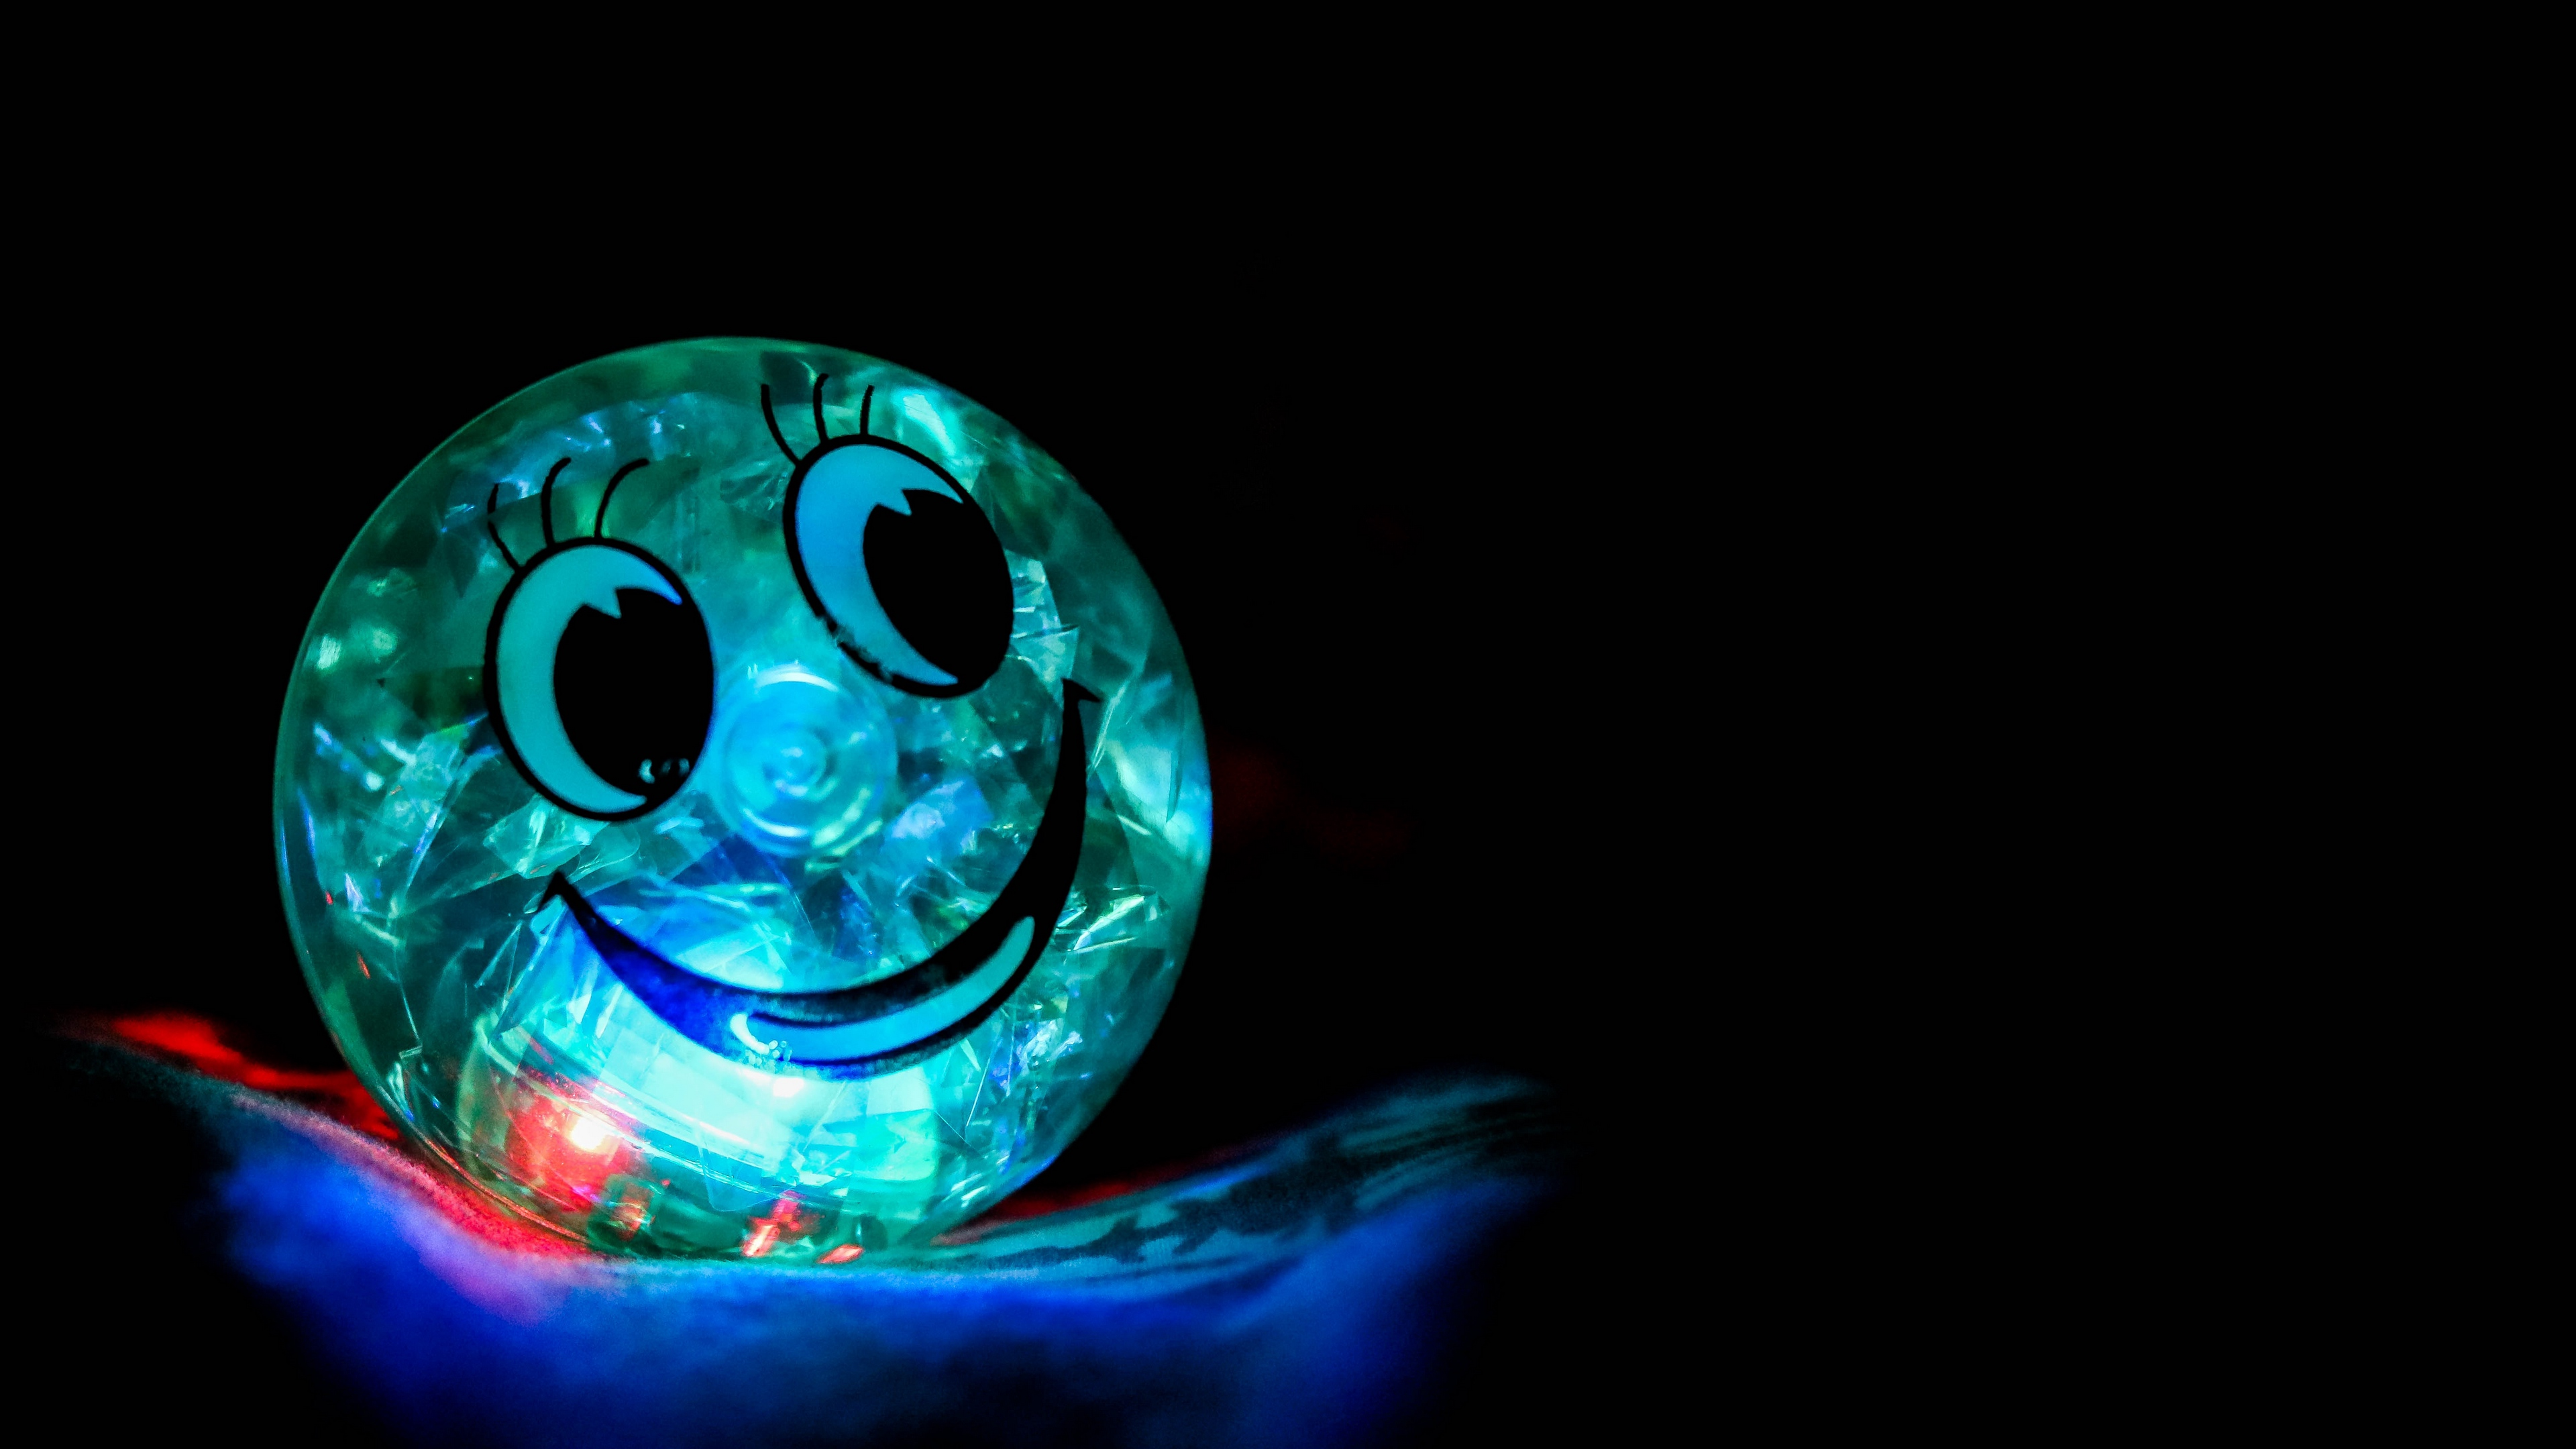 smile happiness ball backlight 4k 1540575289 - smile, happiness, ball, backlight 4k - Smile, happiness, Ball